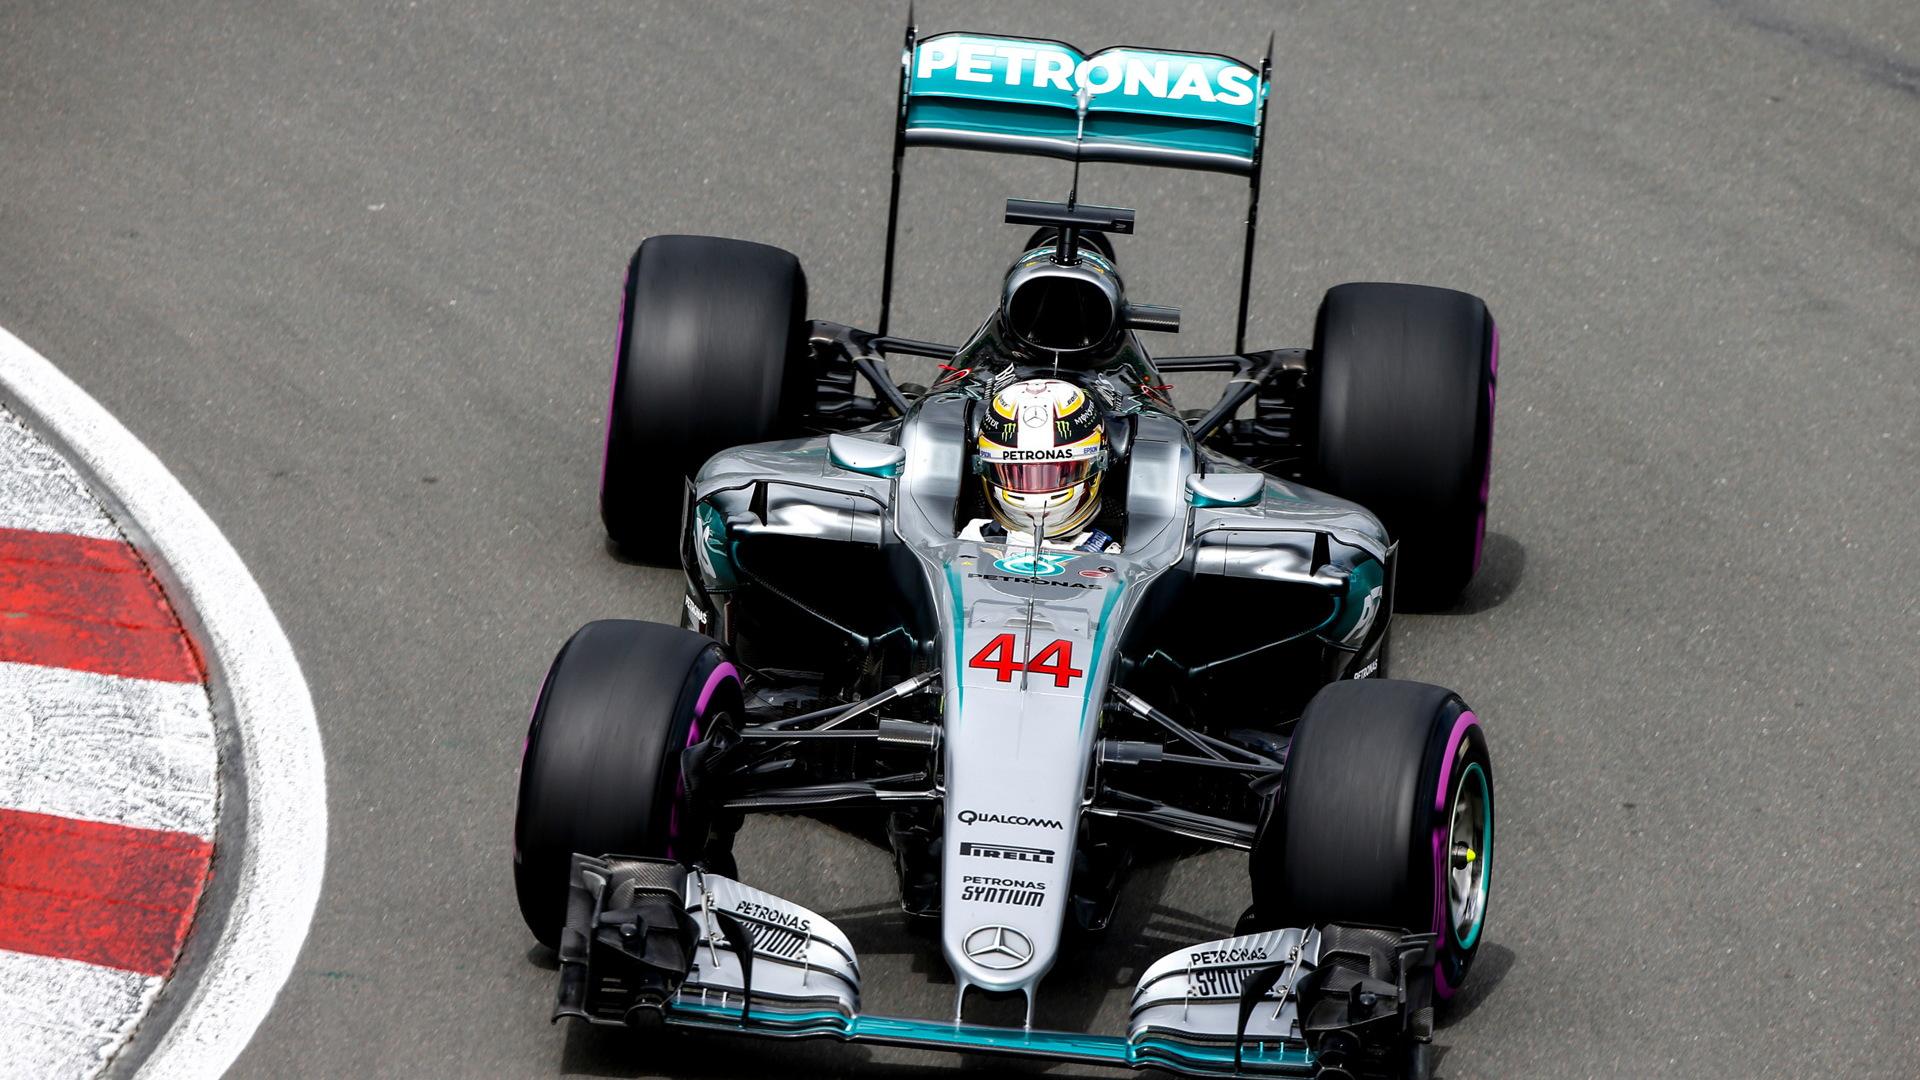 Mercedes AMG's Lewis Hamilton at the 2016 Formula One Canadian Grand Prix